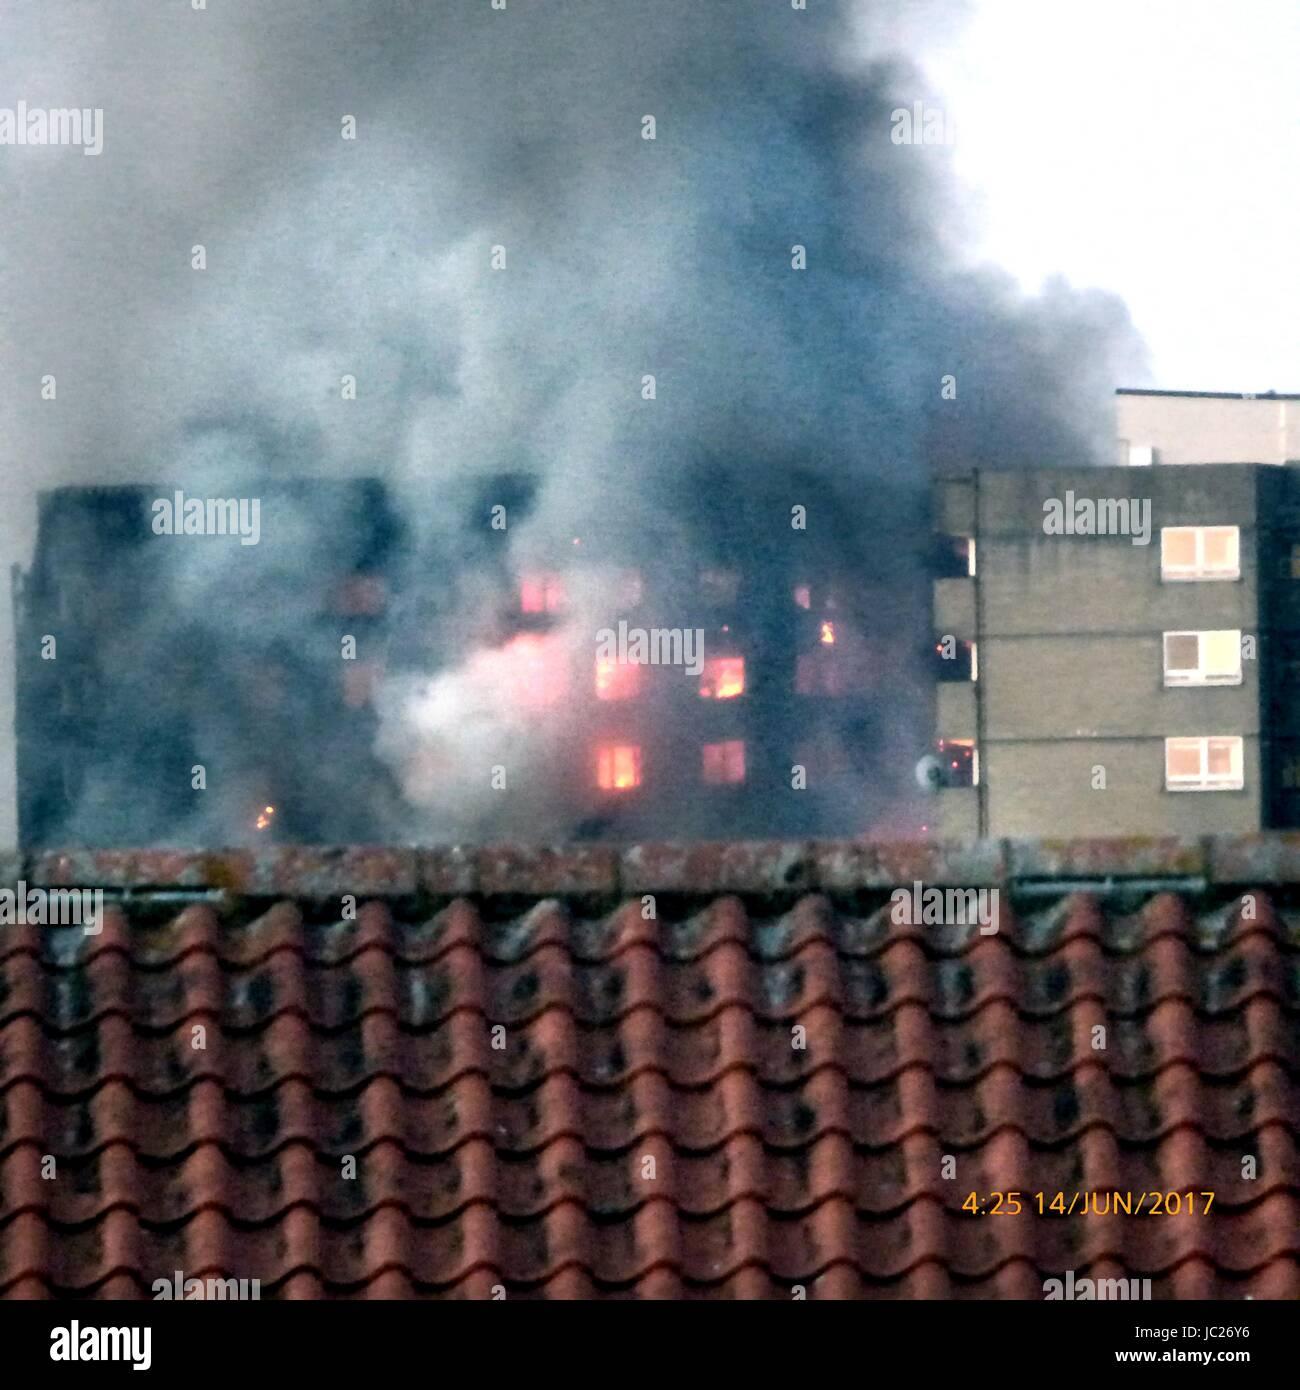 London, UK. 14th June, 2017. Screams heard as huge fire engulfs Residential West London Tower Block Credit: Kevin - Stock Image